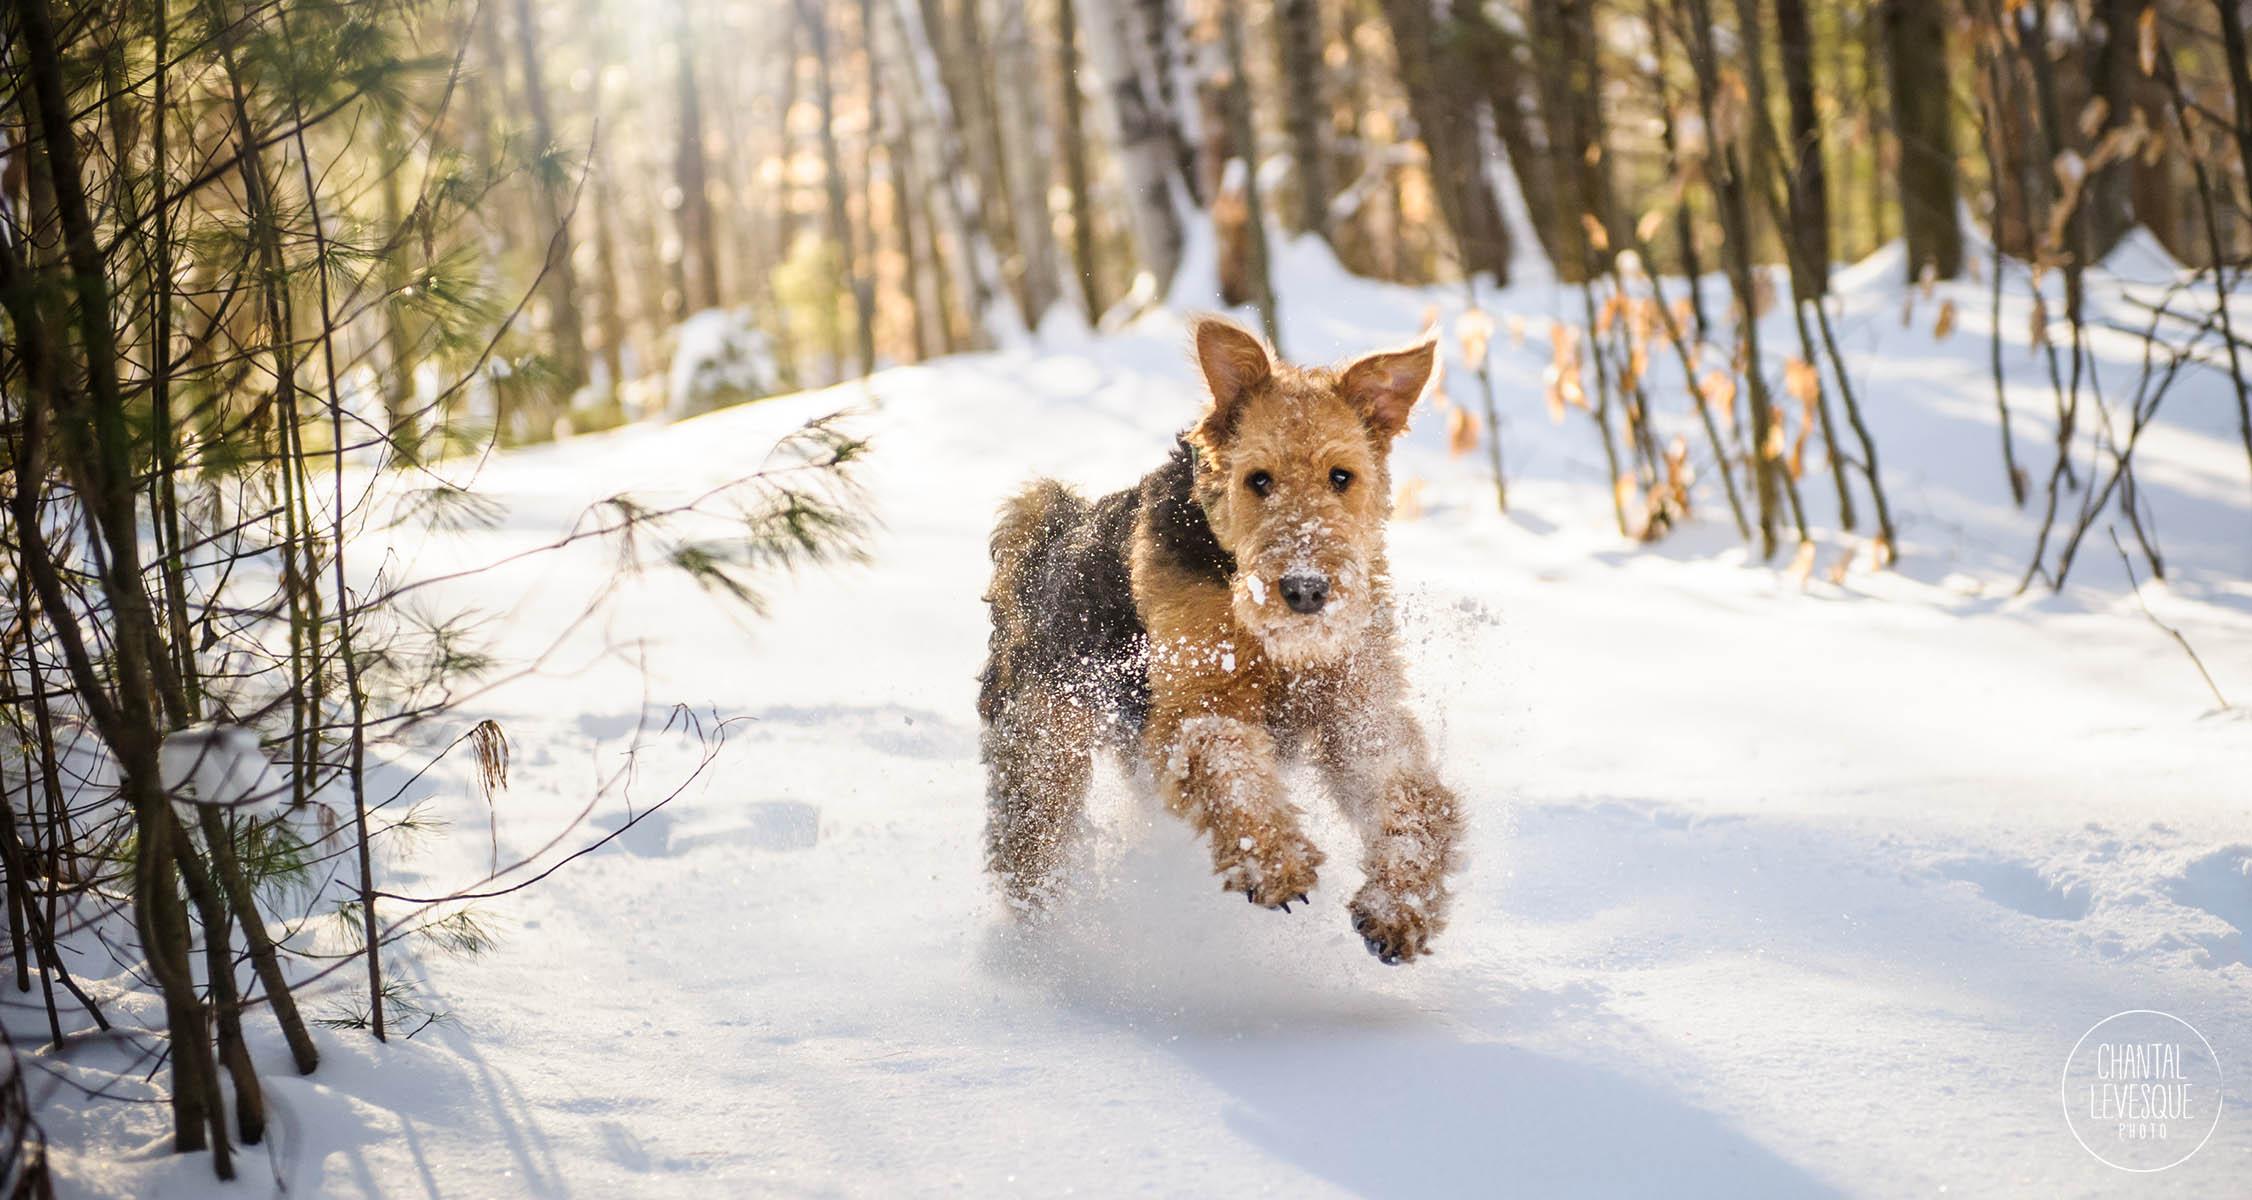 dog-running-snow-photography.jpg